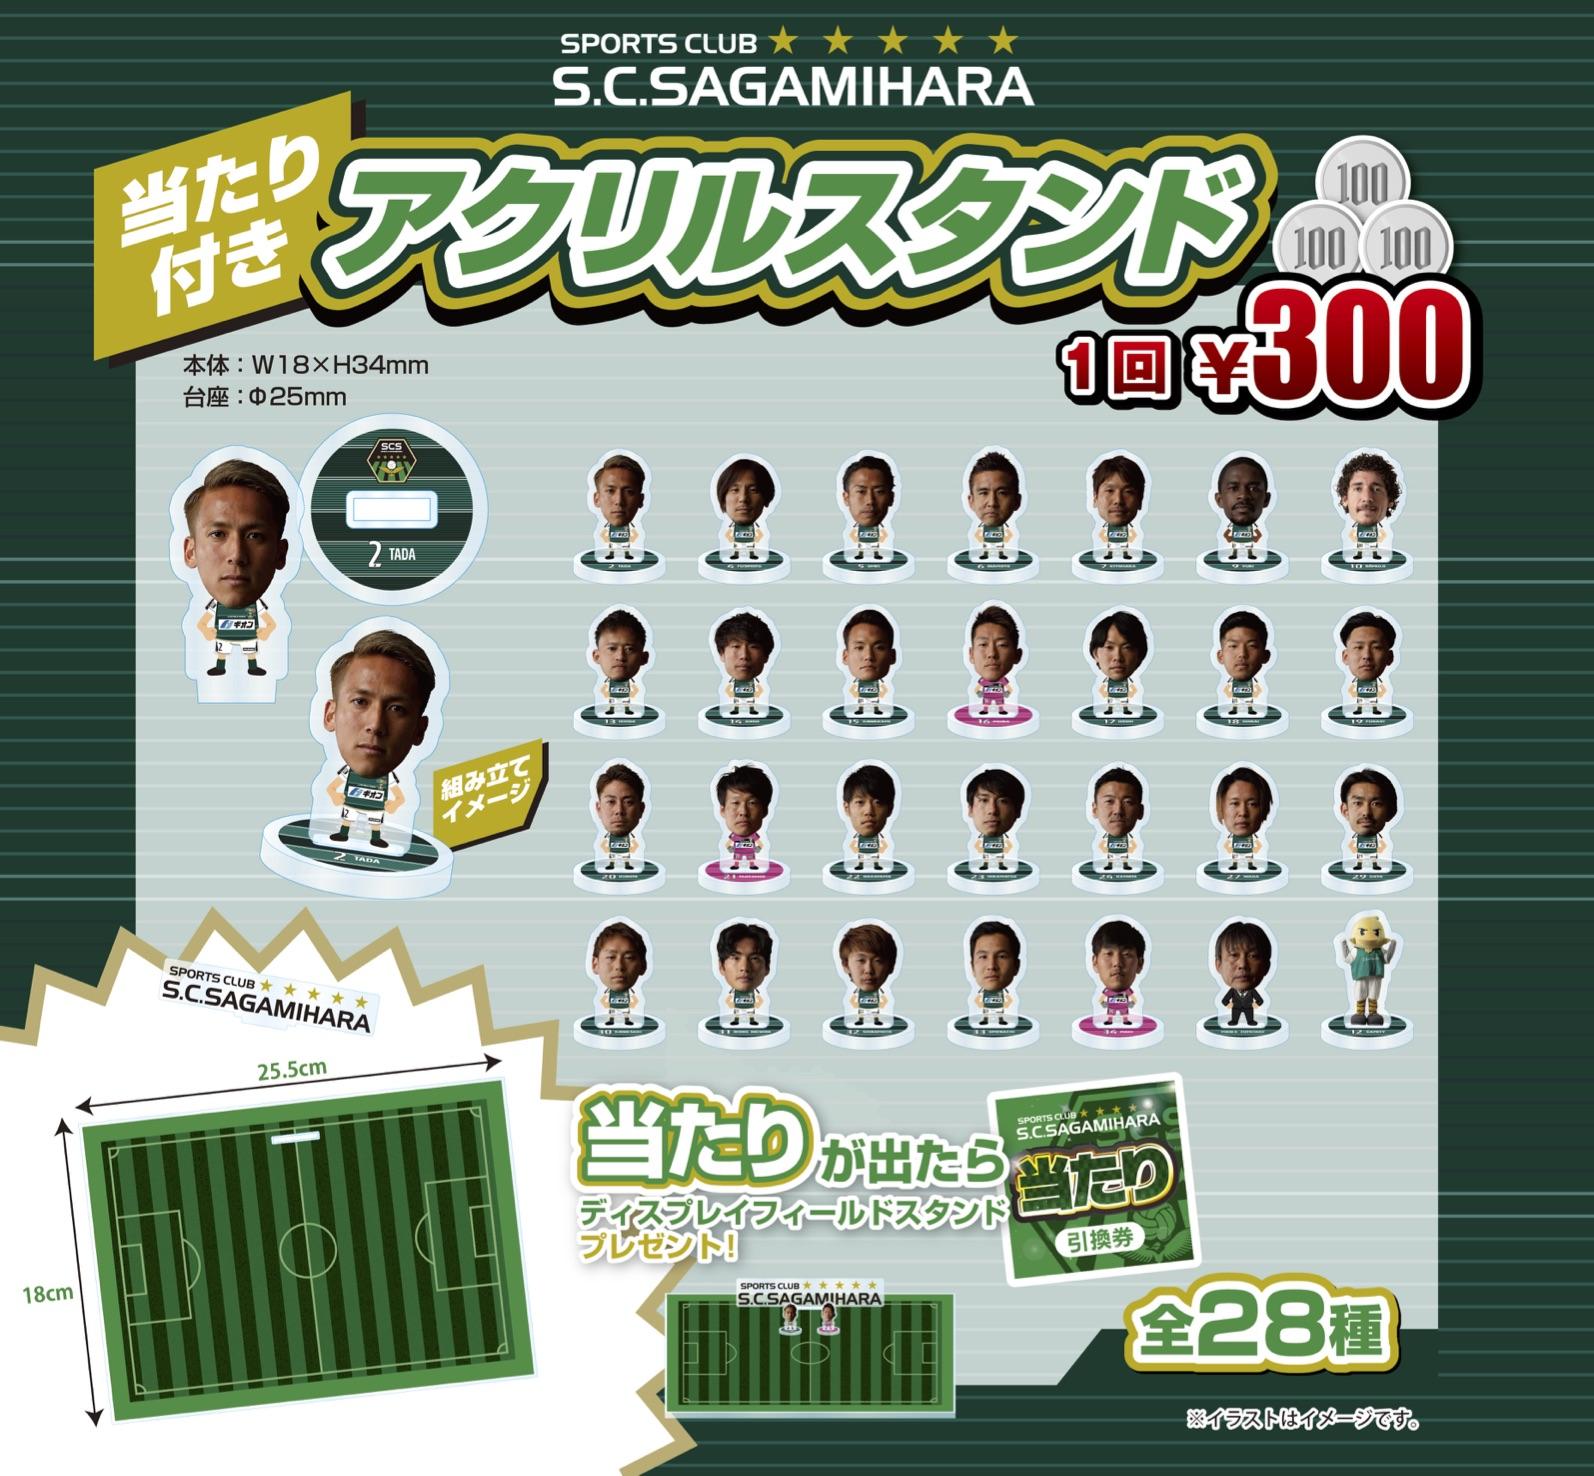 sagamihara_acrylstand_daishi_0317.jpg